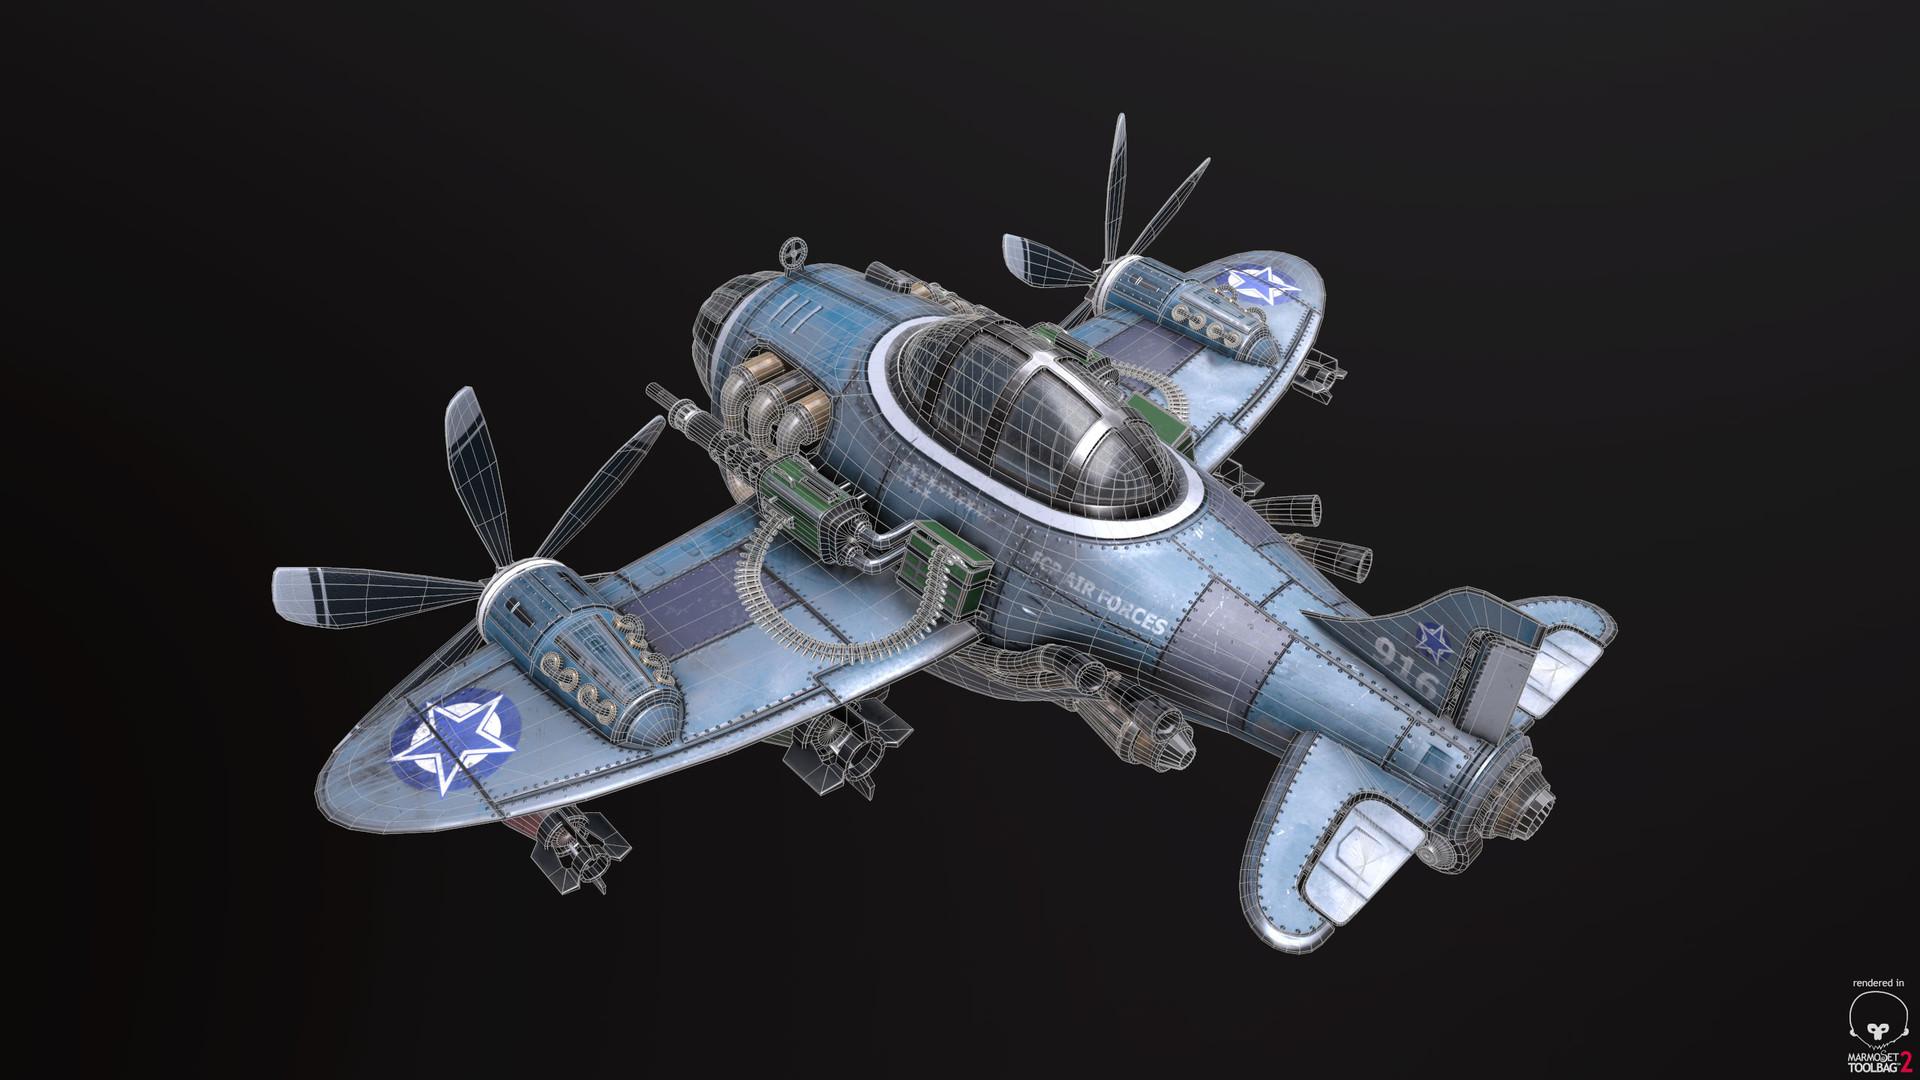 Andrey lukashov planes8